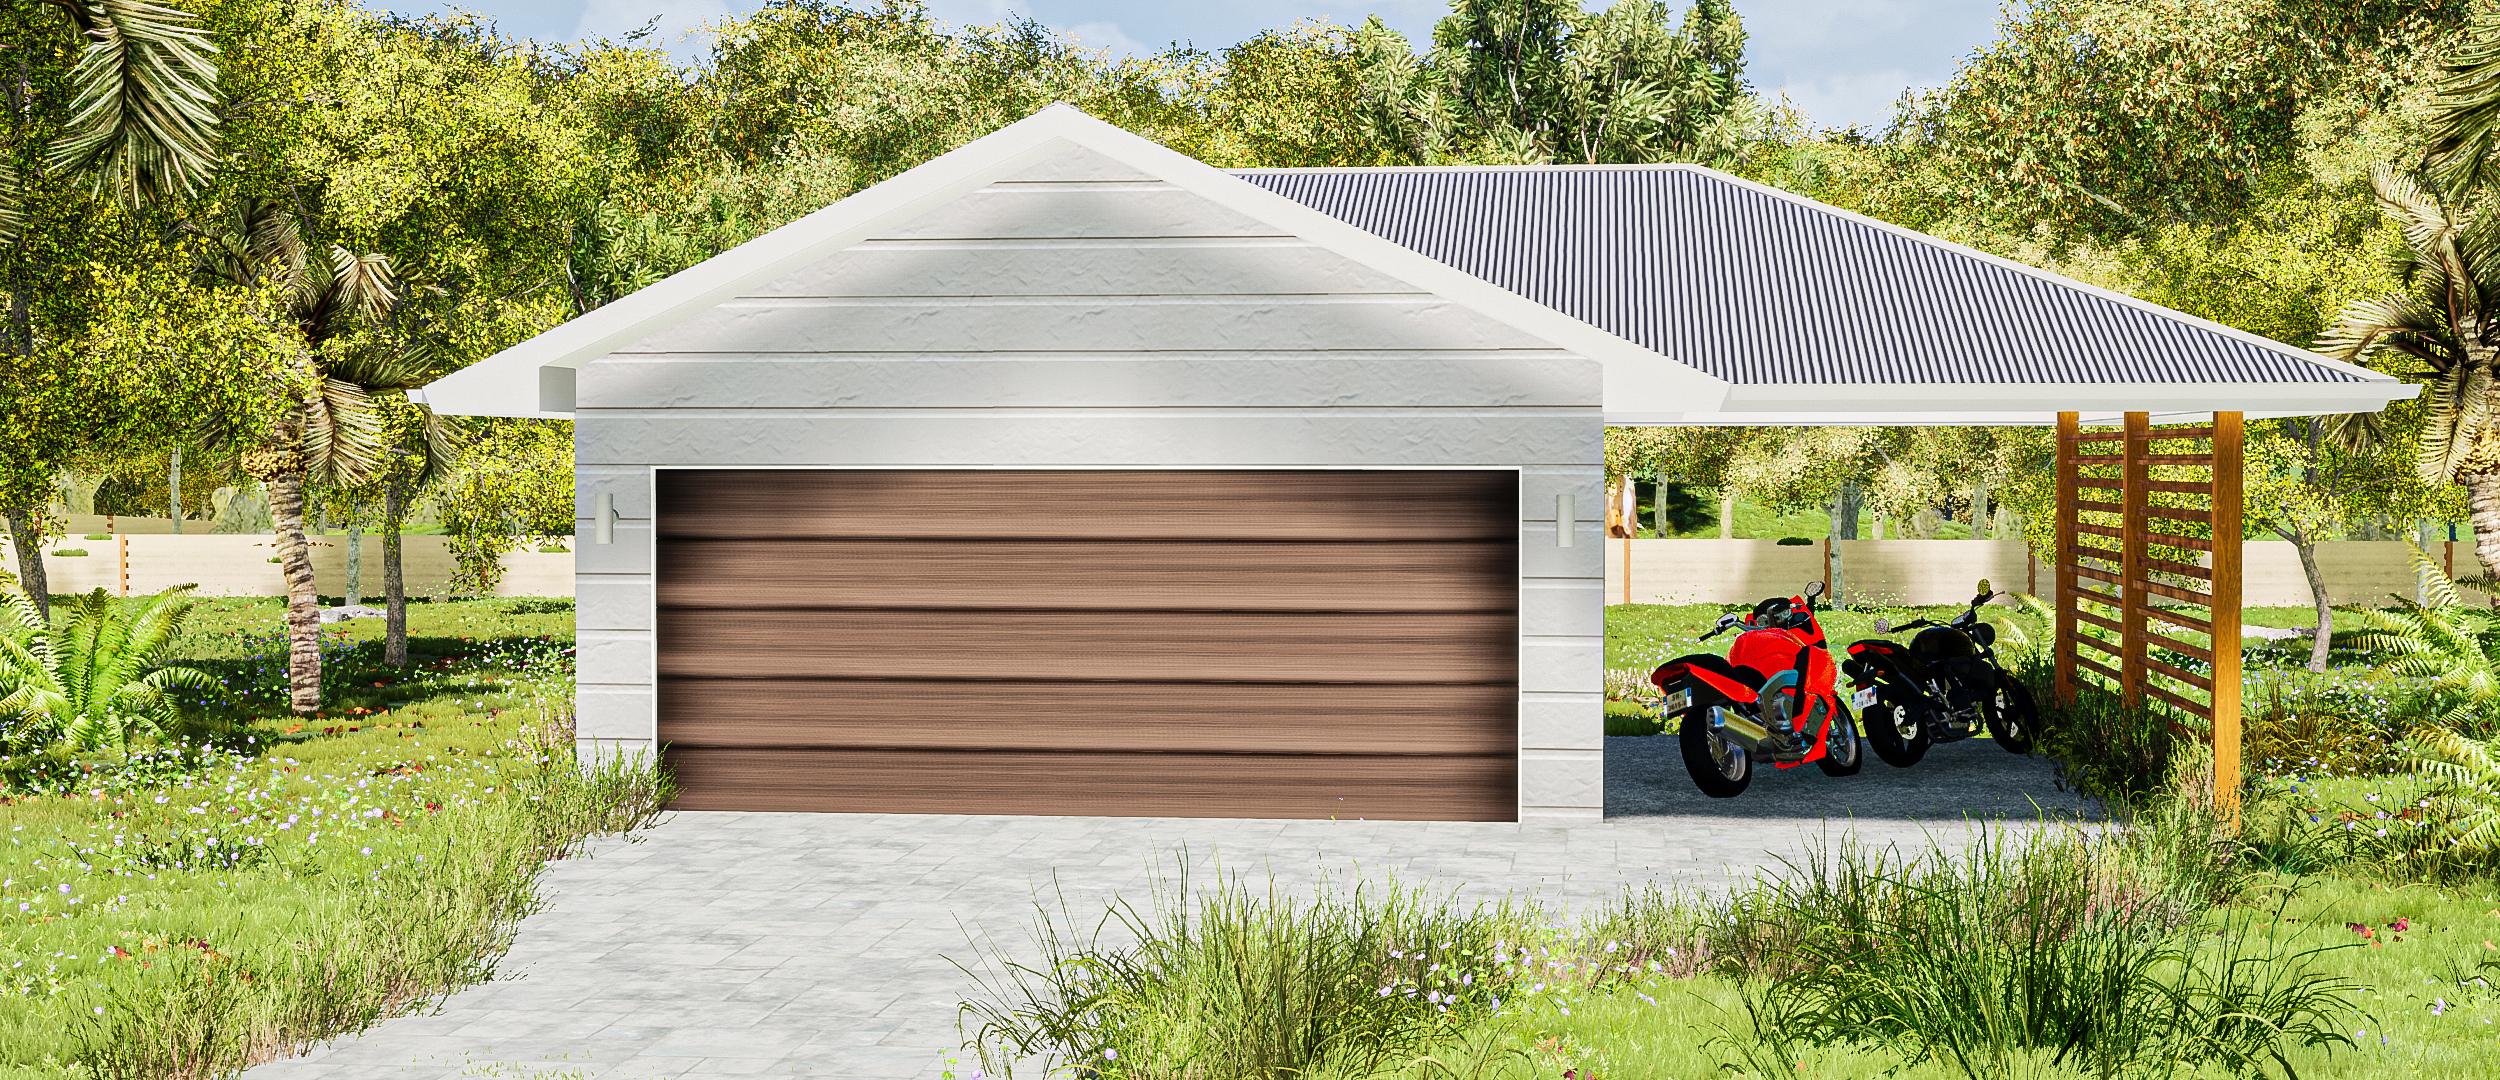 6x6 + garaport front